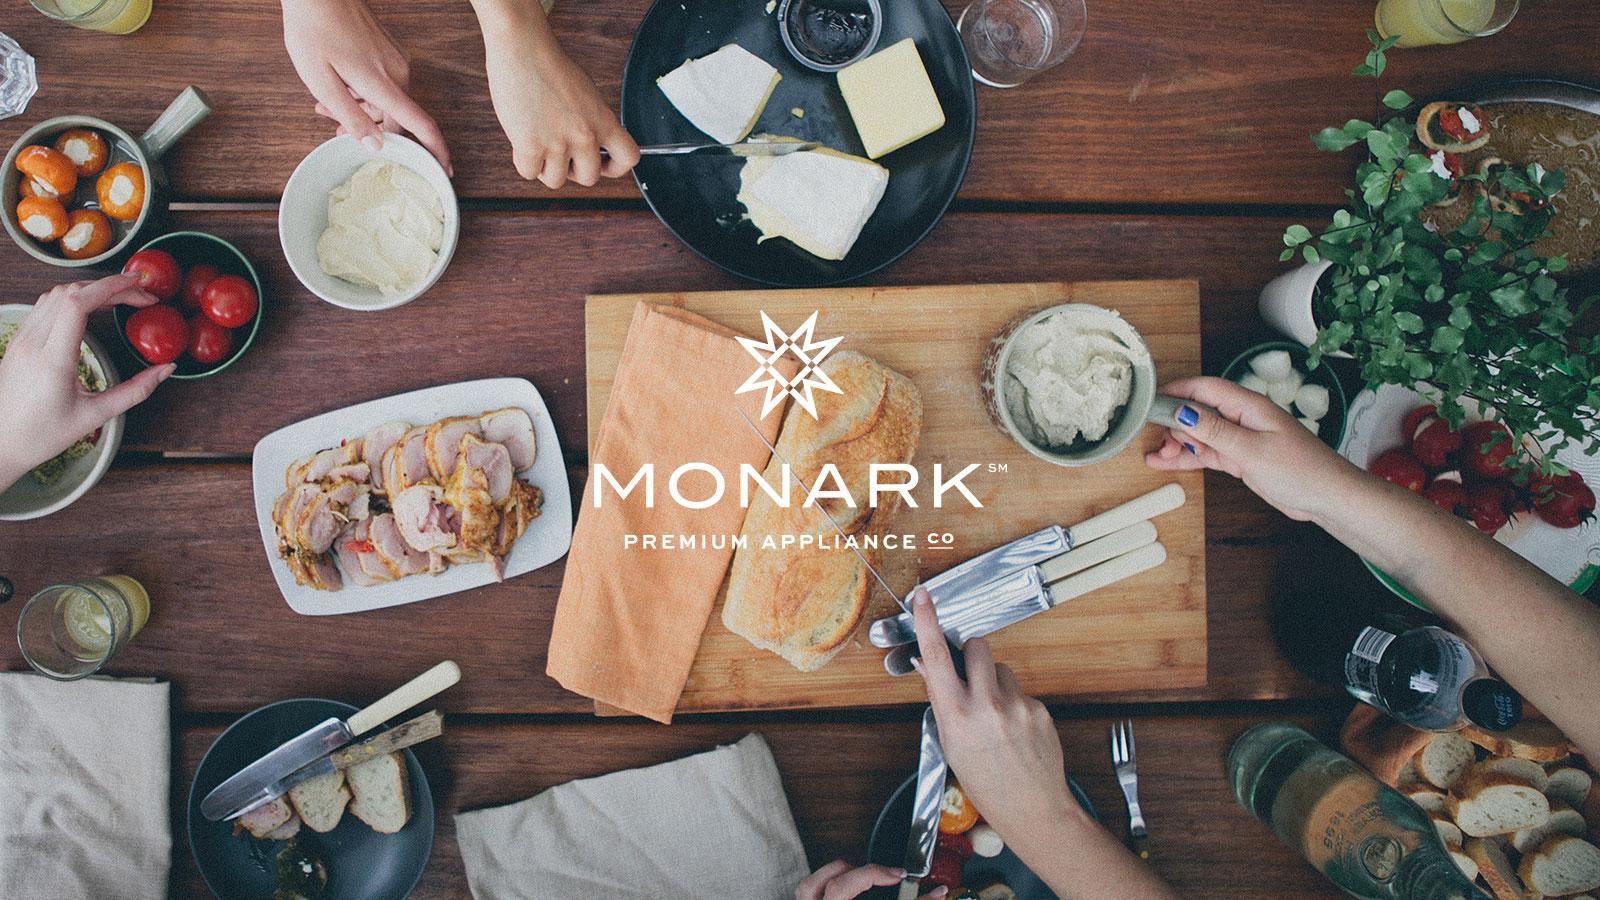 Monark Premium Liance Co